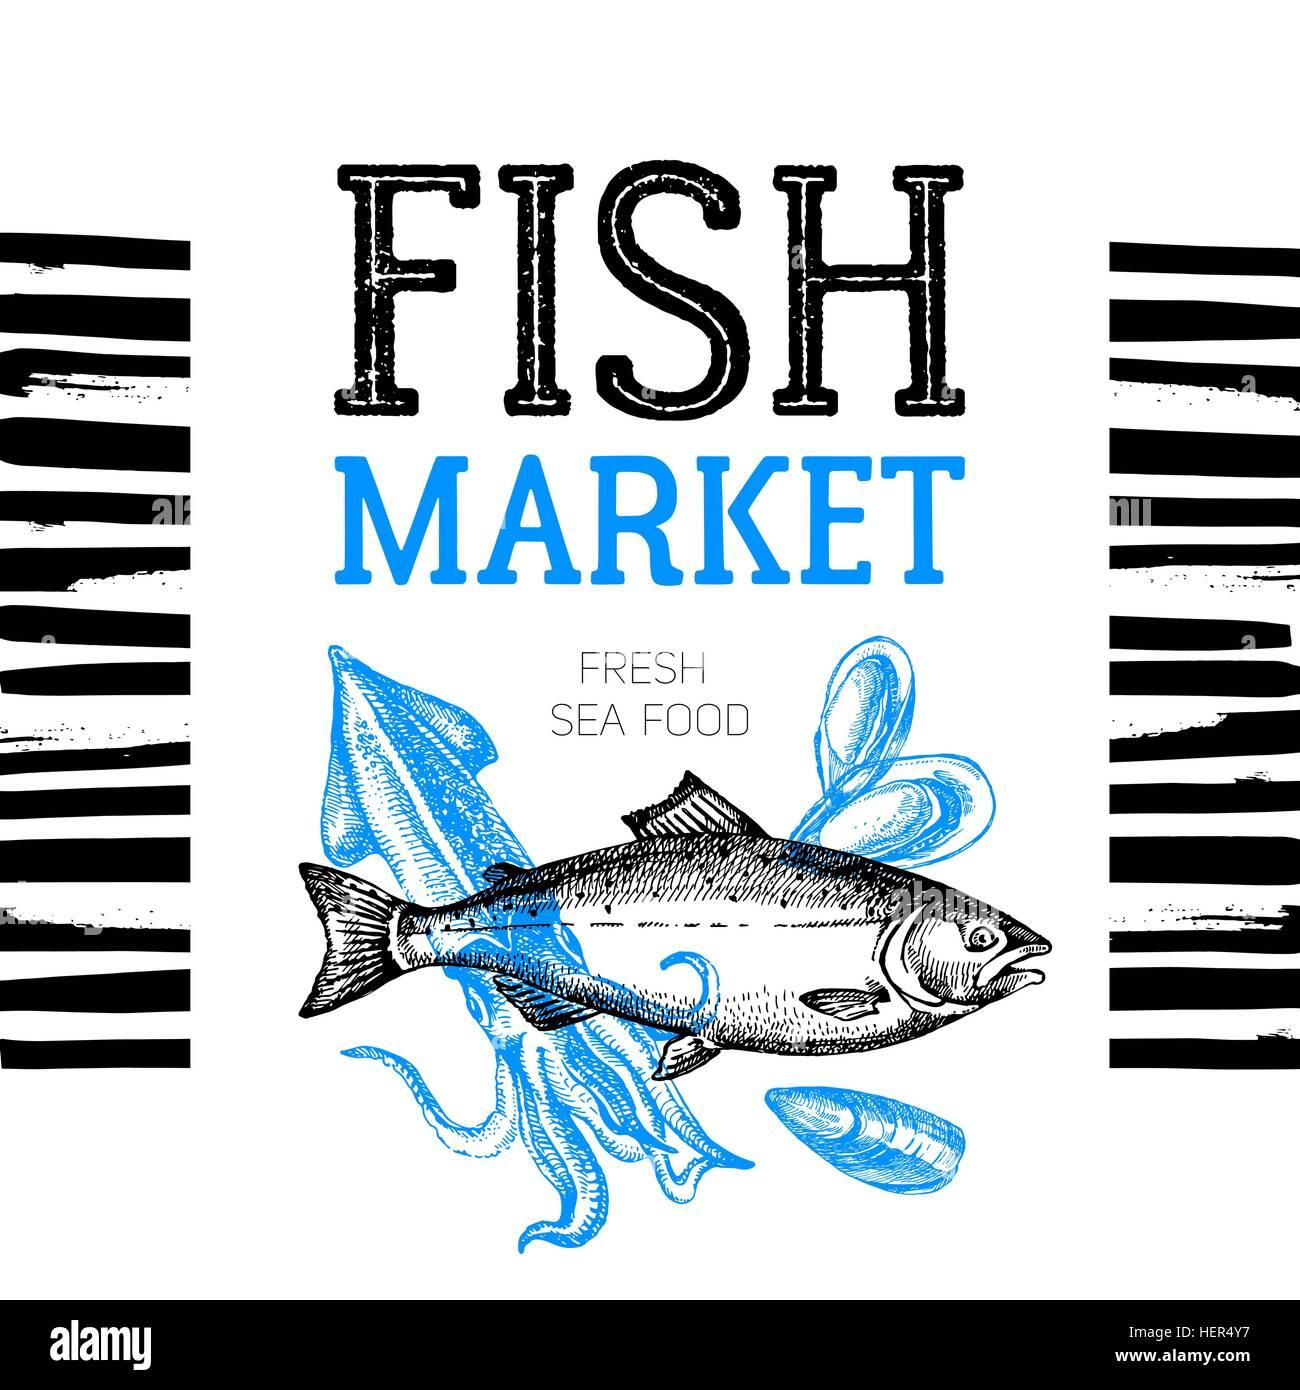 Restaurant Fresh Sea Food Menu Fish Market Pakage And Poster Hand Drawn Sketch Vector Illustration